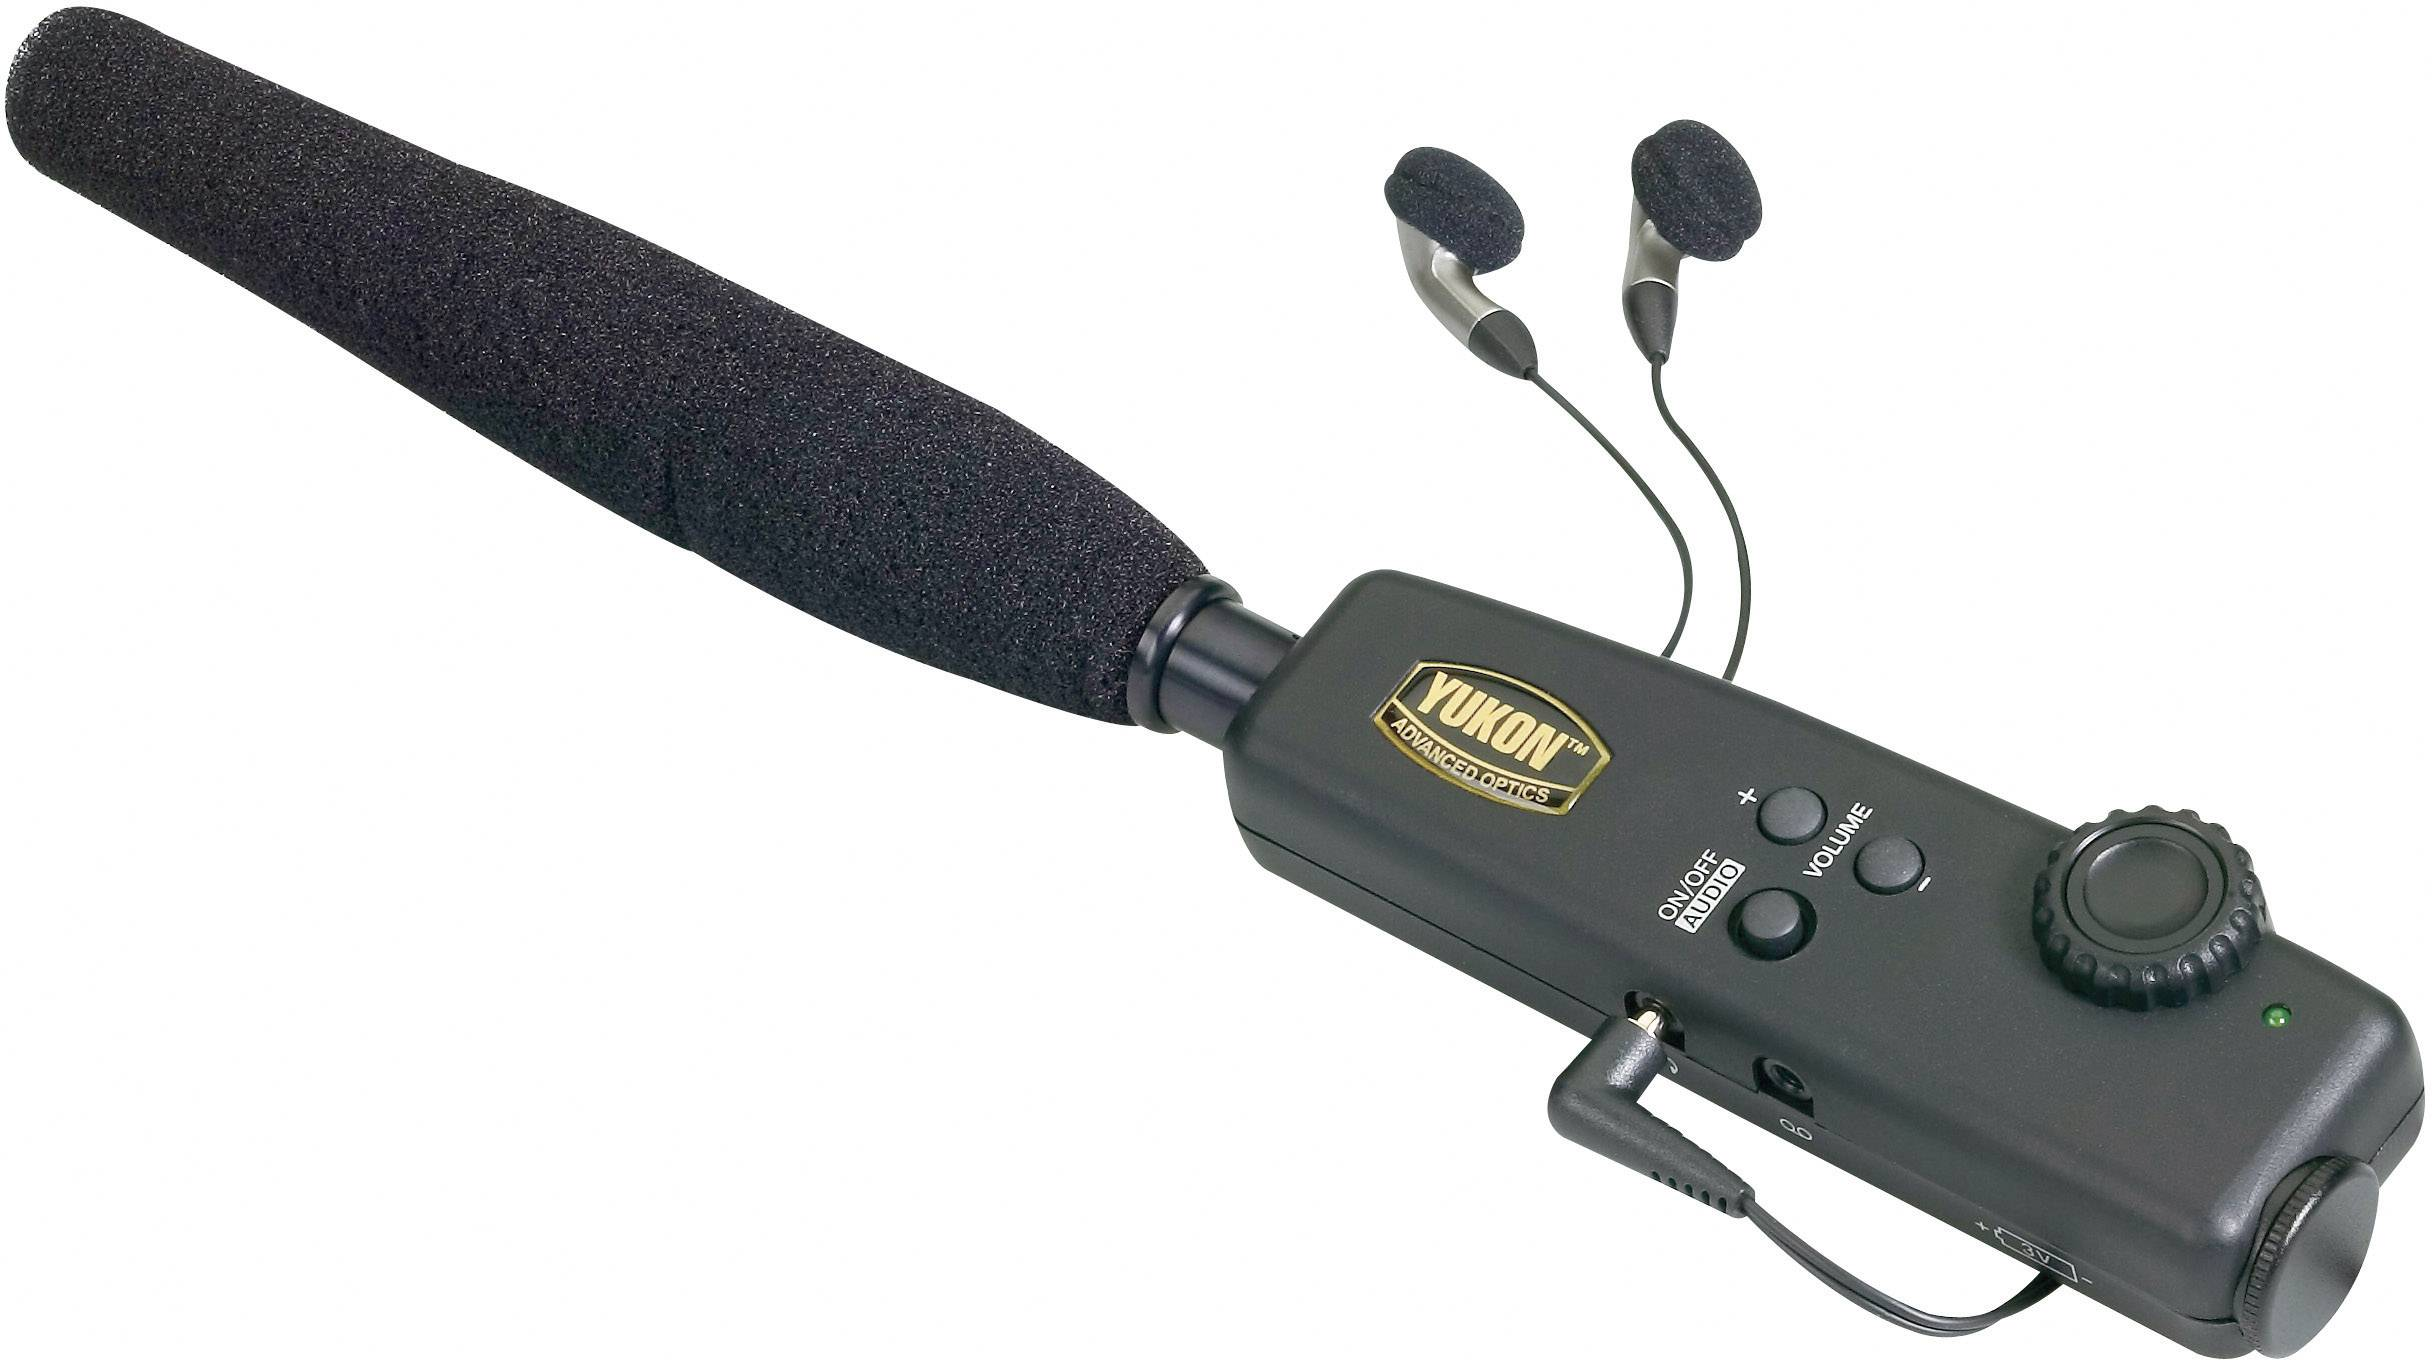 Směrový mikrofon Yukon DSAS